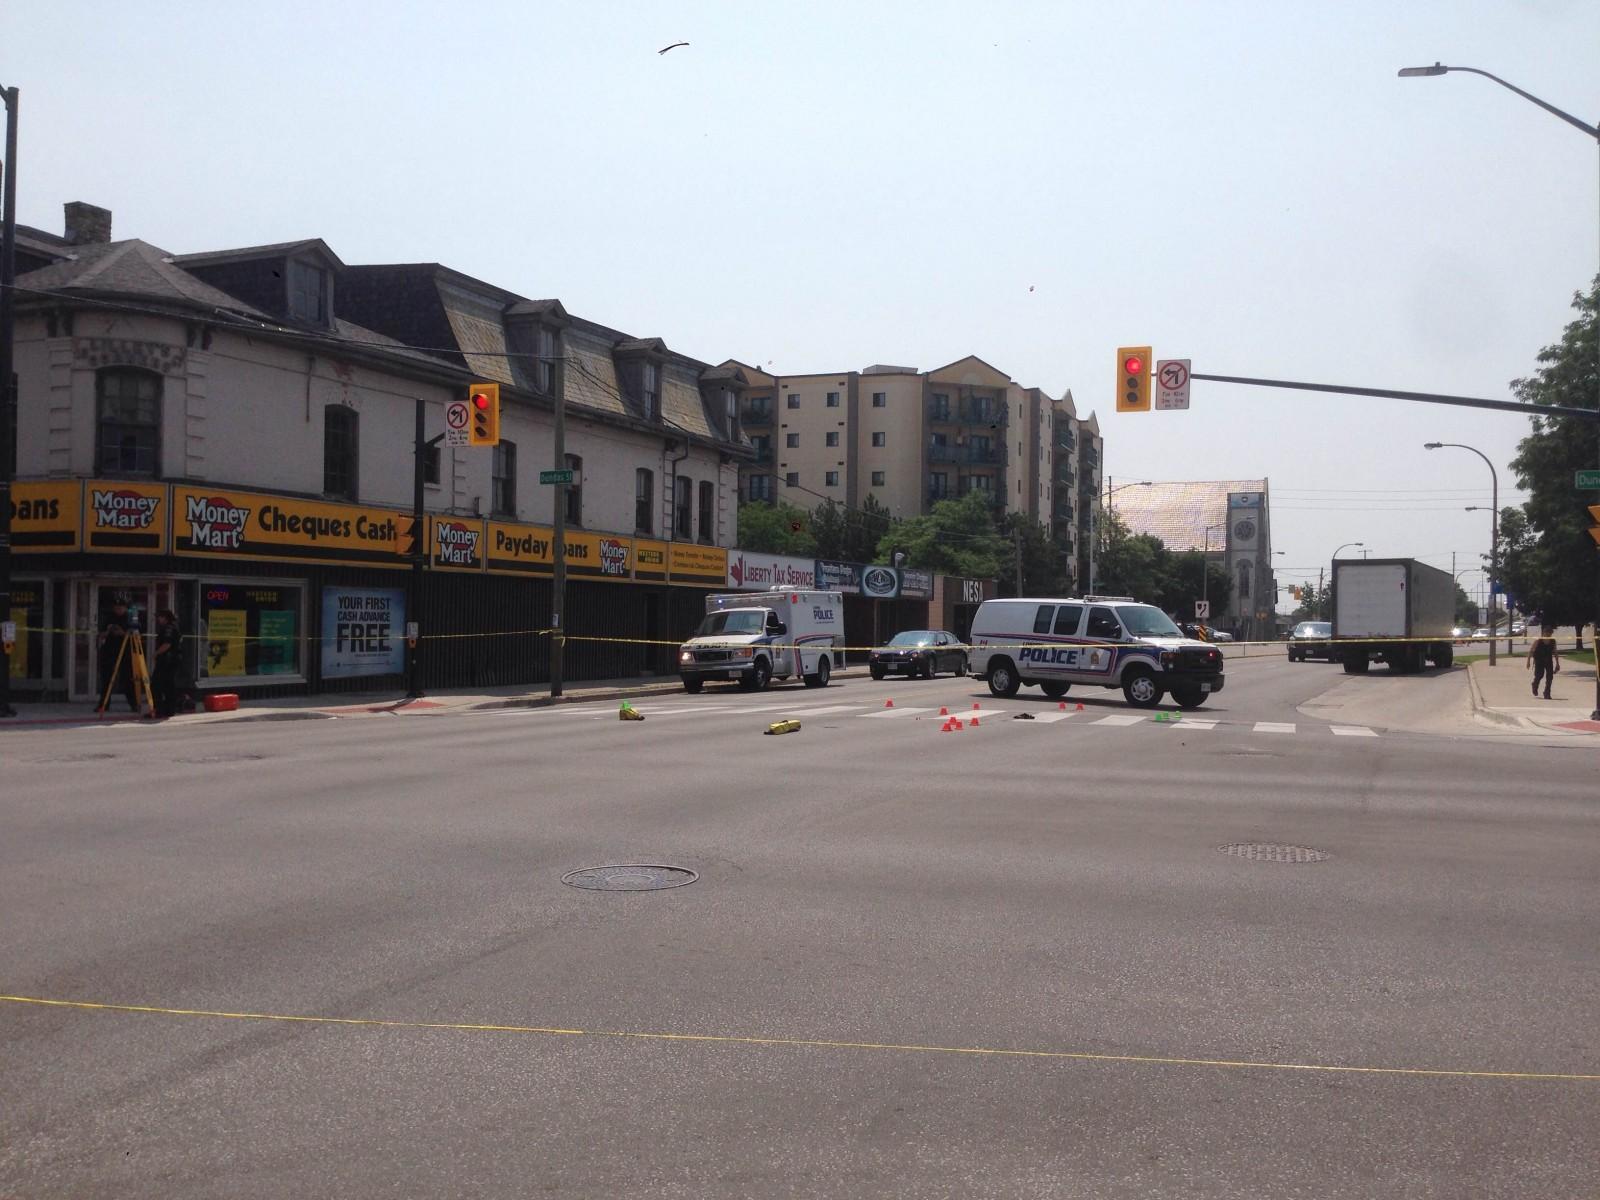 Two crashes on Dundas St. send pedestrians to hospital